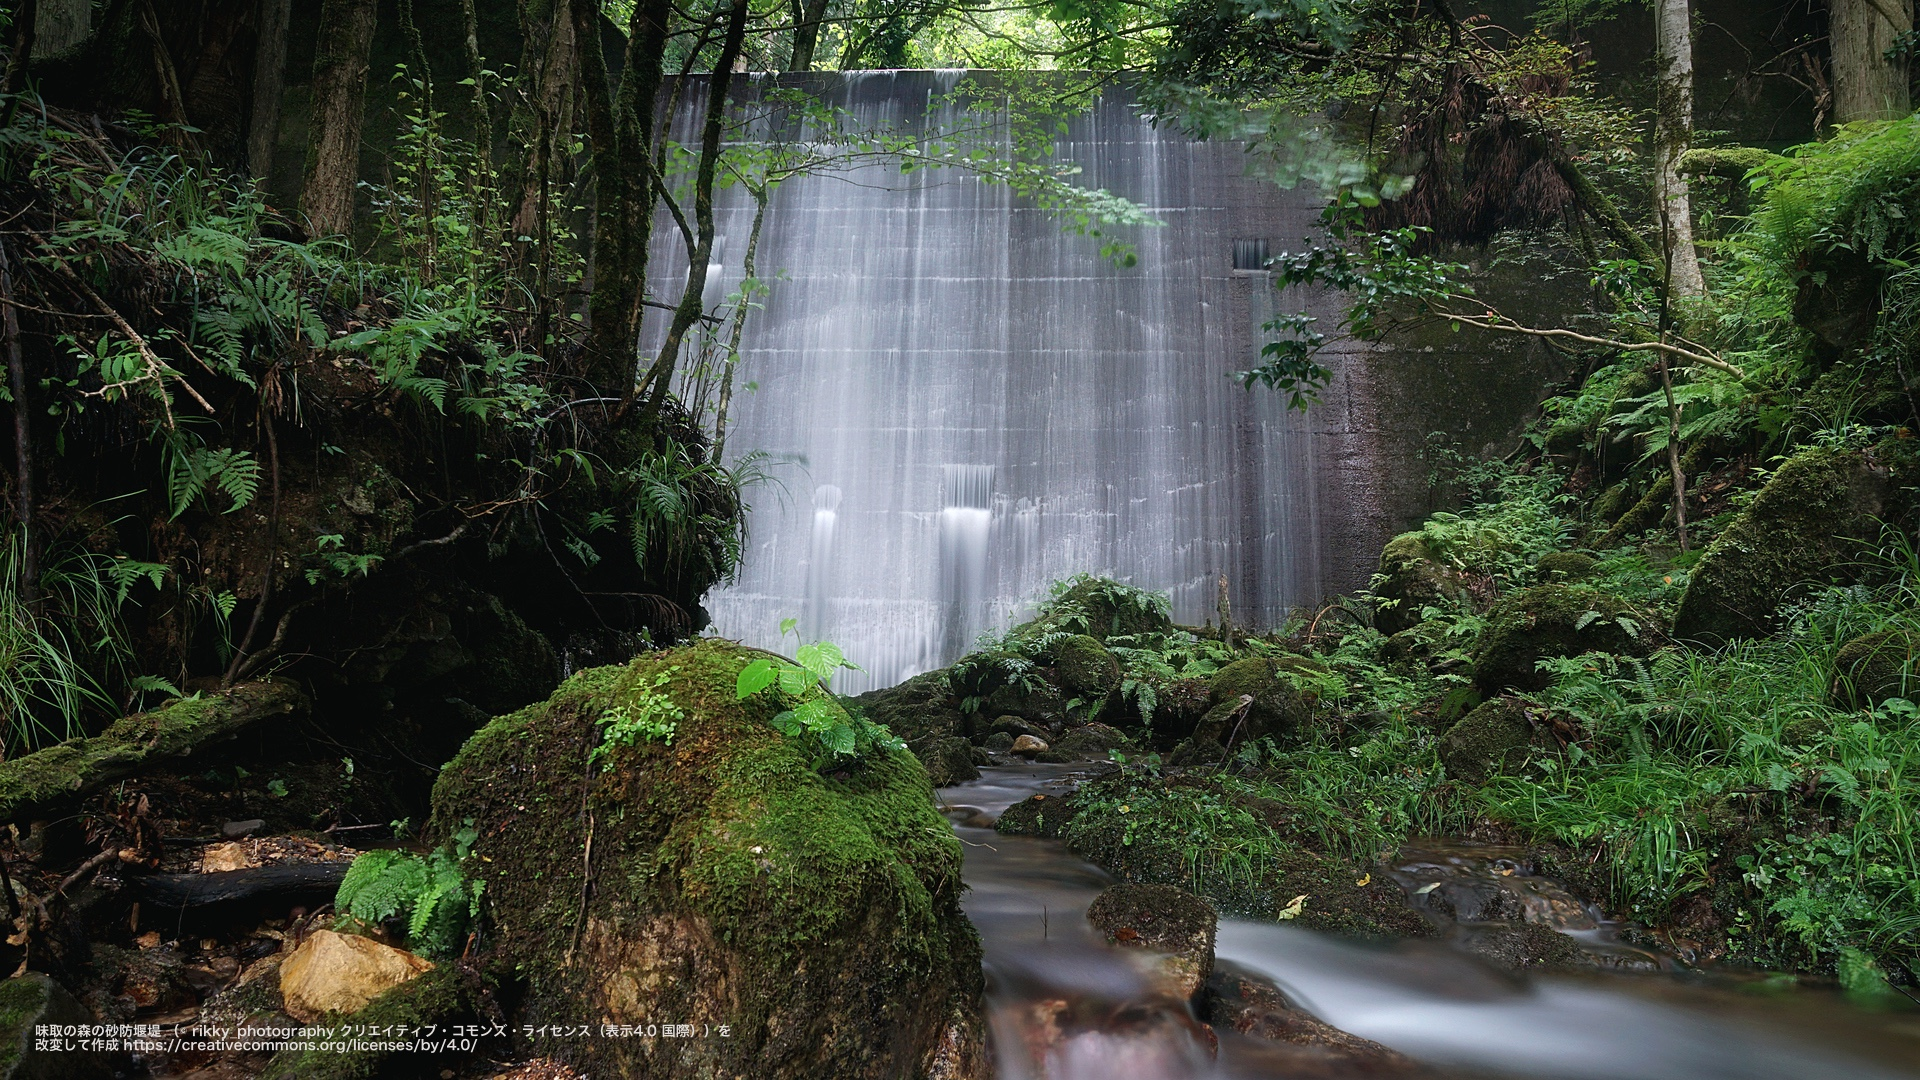 味取の森の砂防堰堤 (兵庫県)